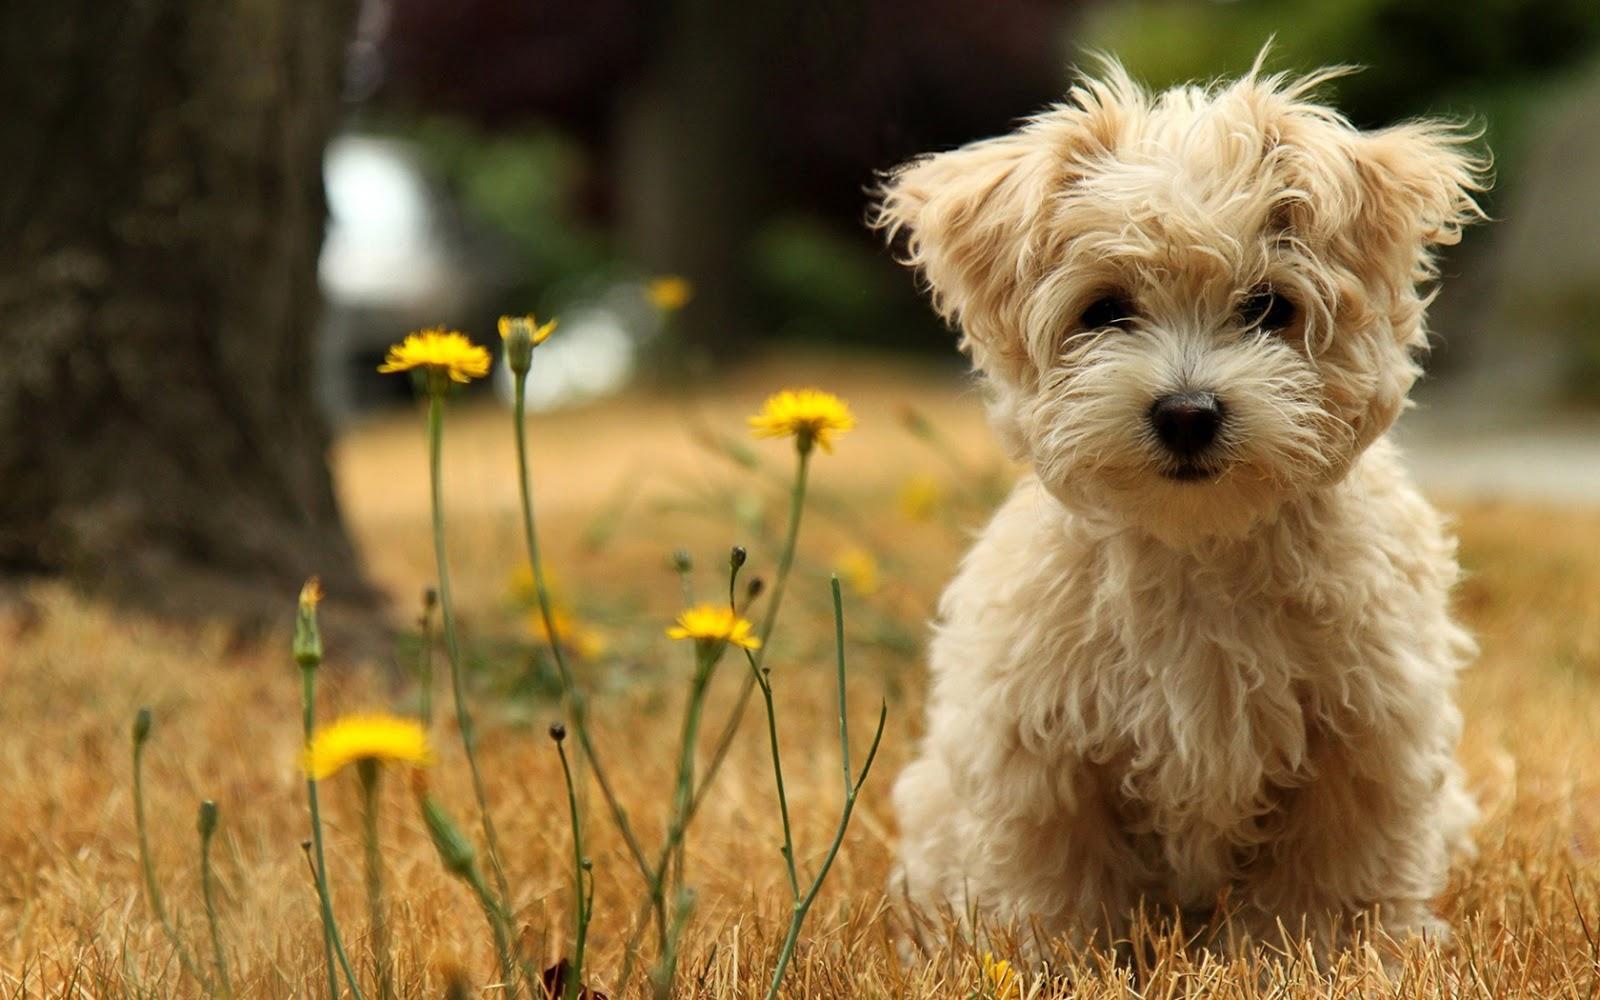 Cute Puppies HD Wallpapers – wallpaper202